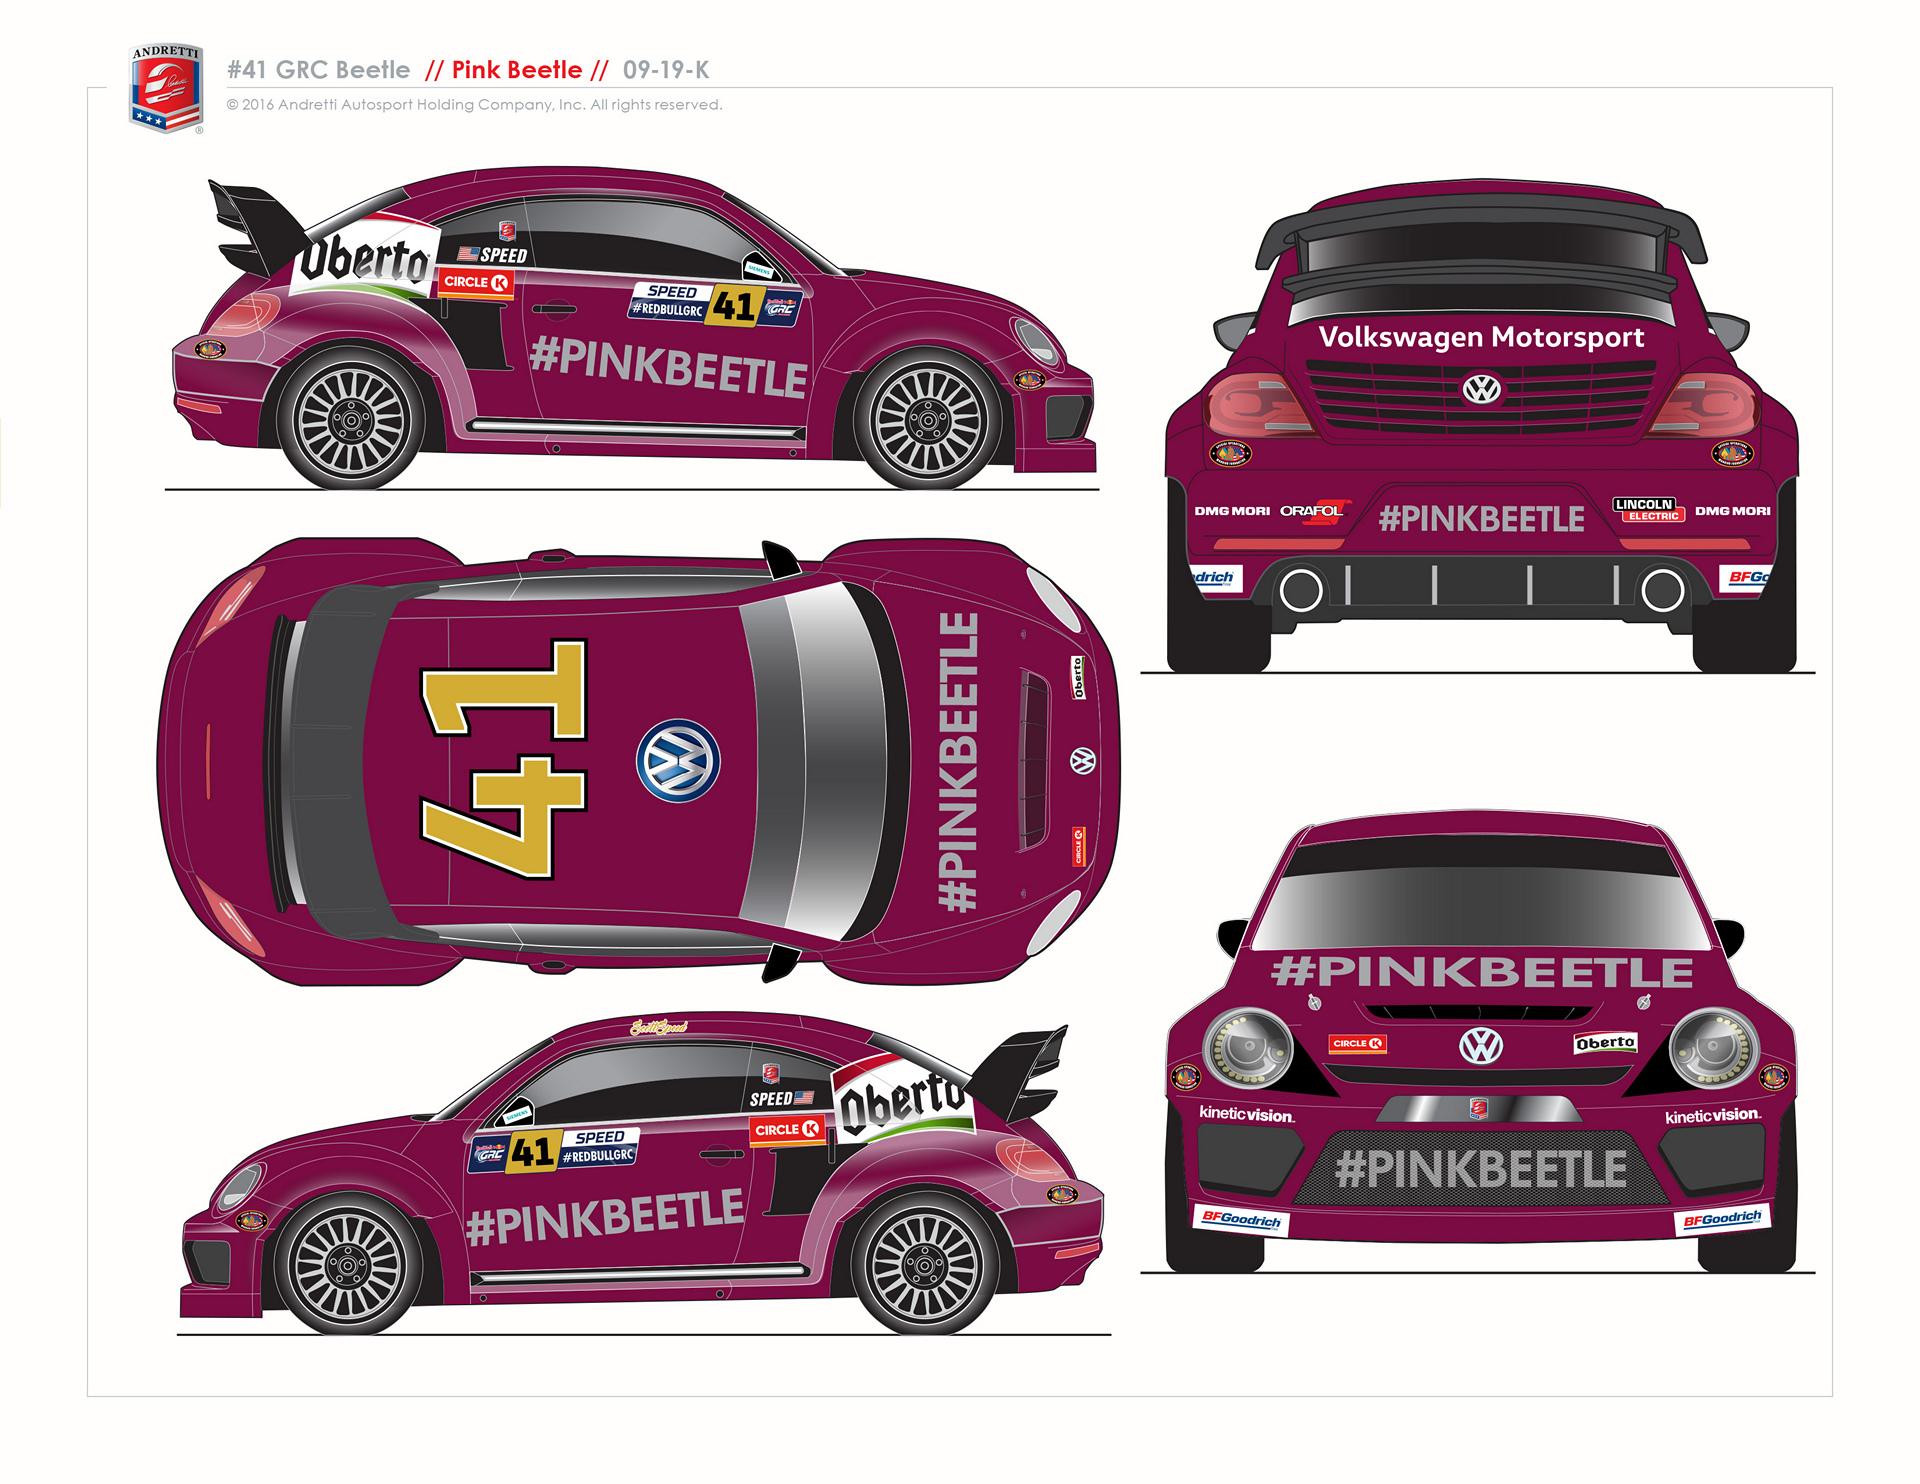 No. 41 #PinkBeetle GRC © Volkswagen AG